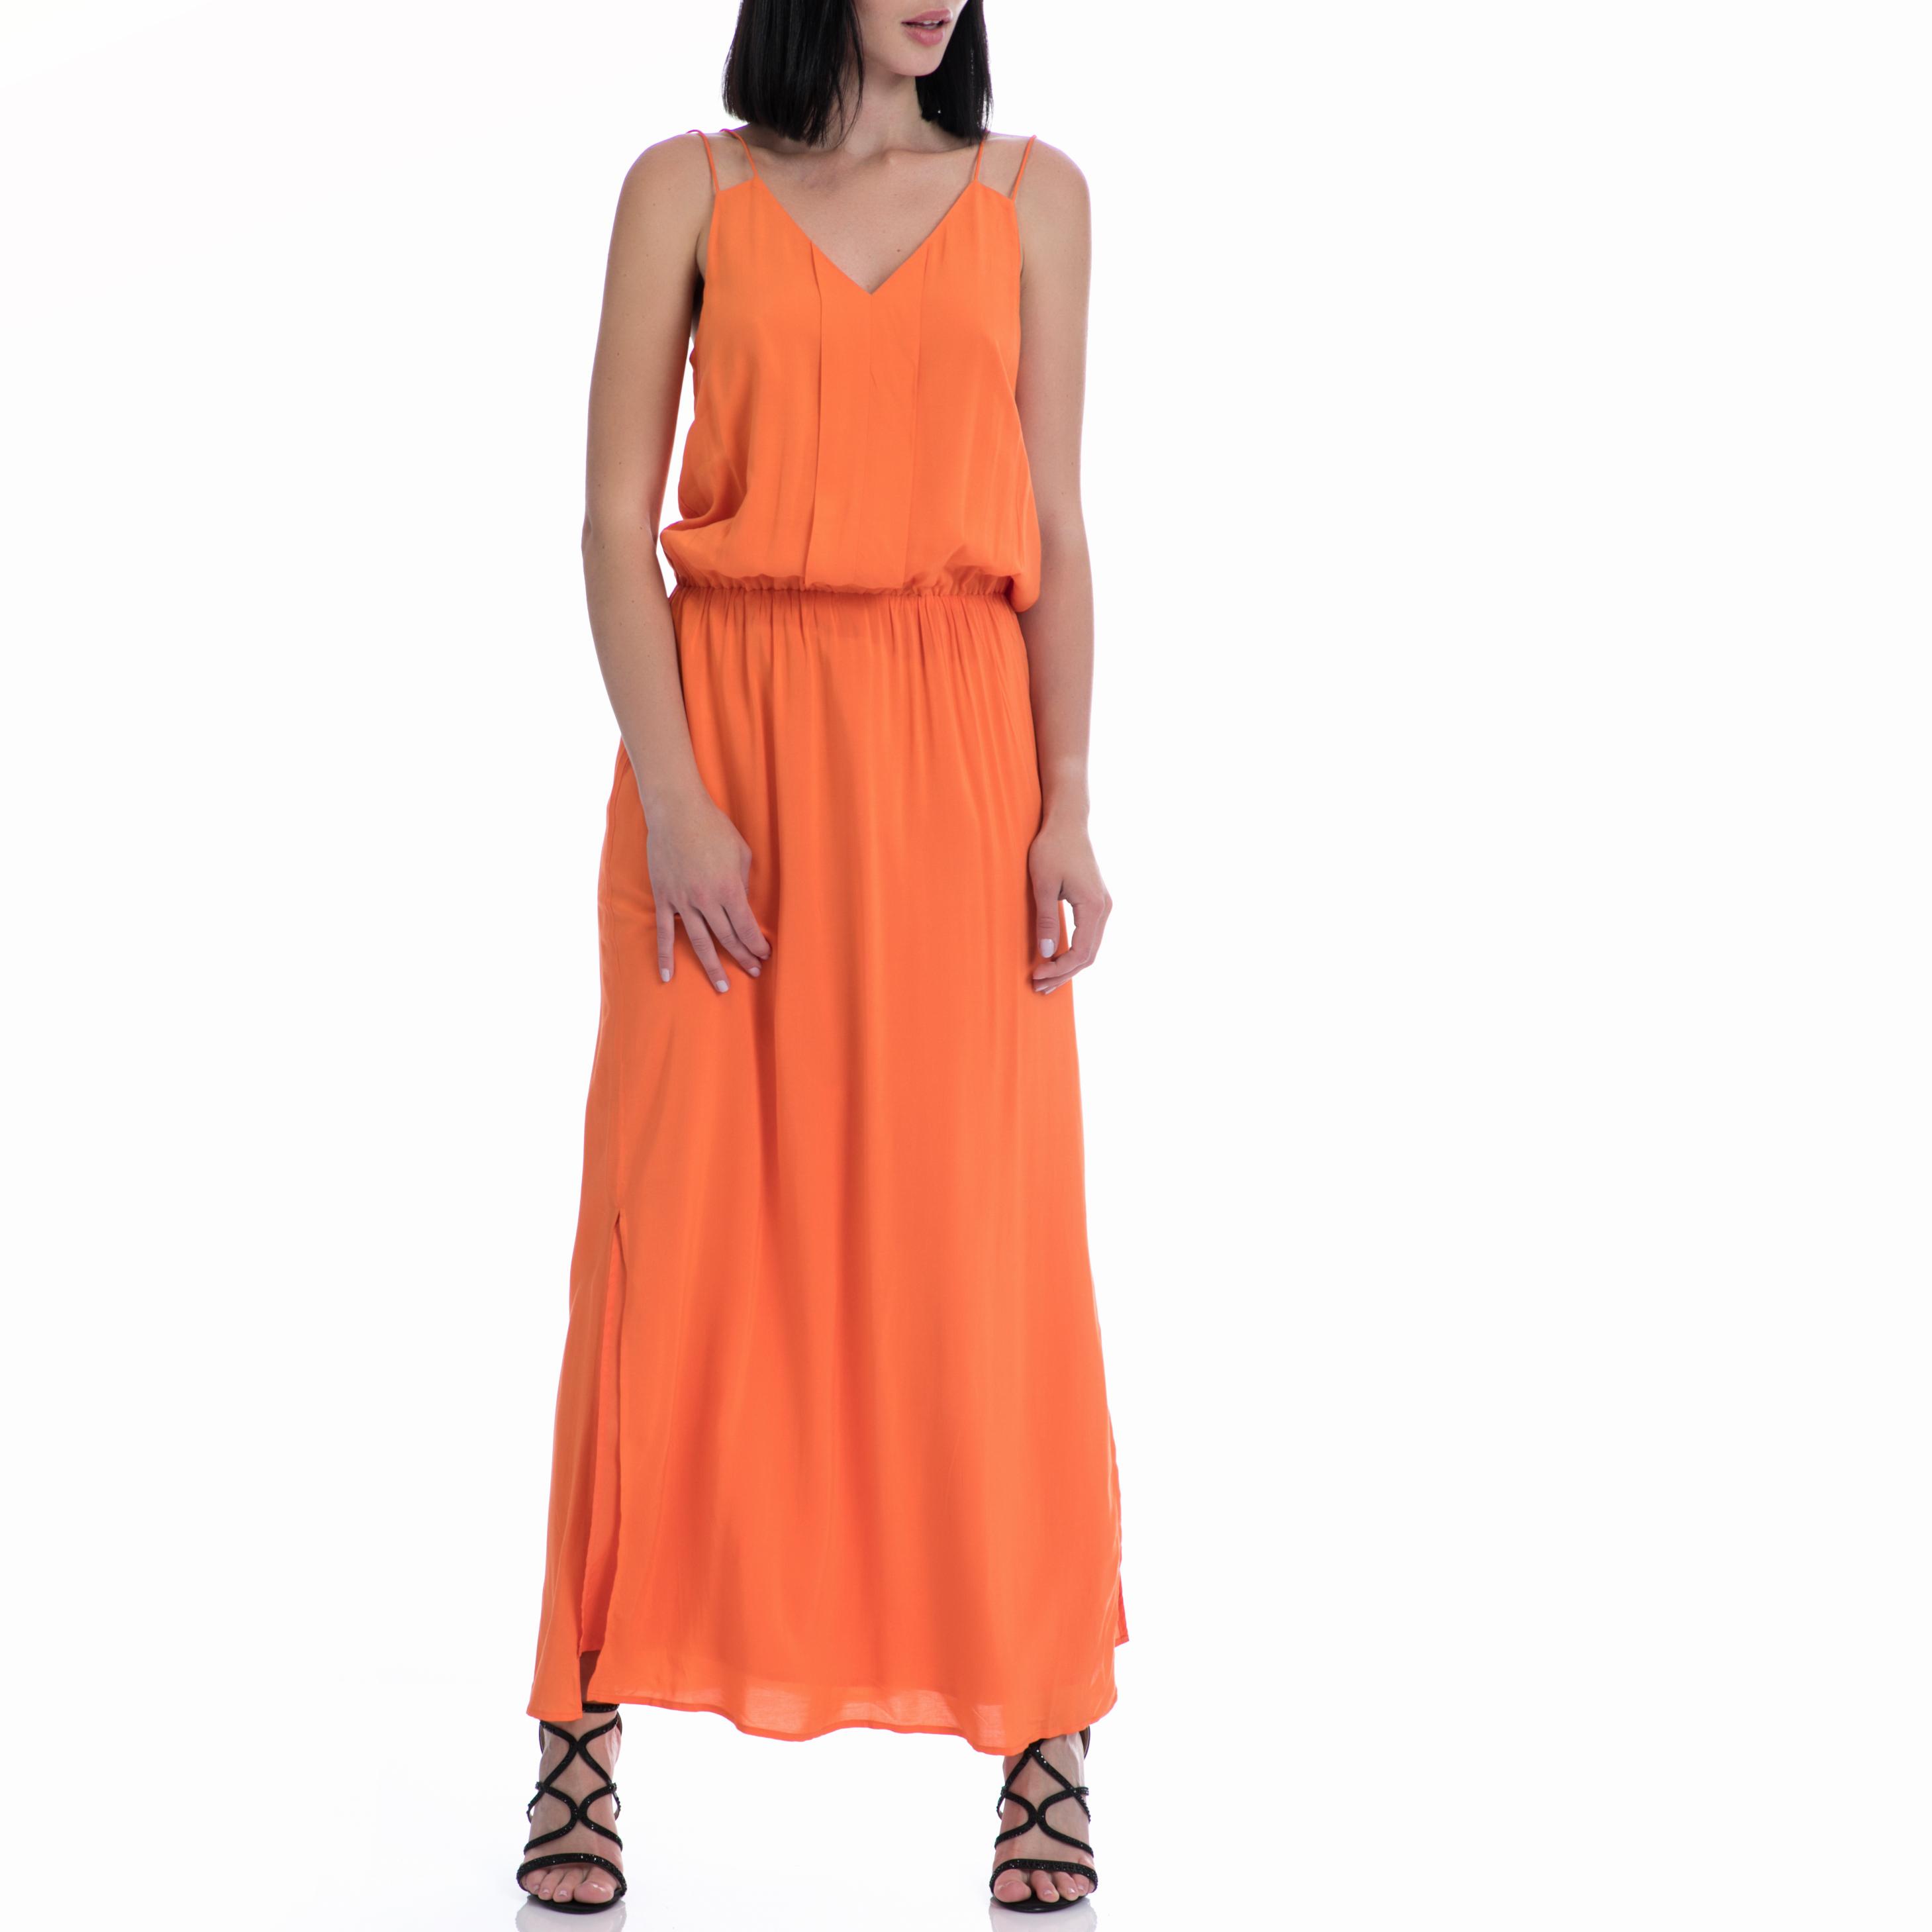 MOTIVI - Φόρεμα MOTIVI πορτοκαλί γυναικεία ρούχα φορέματα μάξι